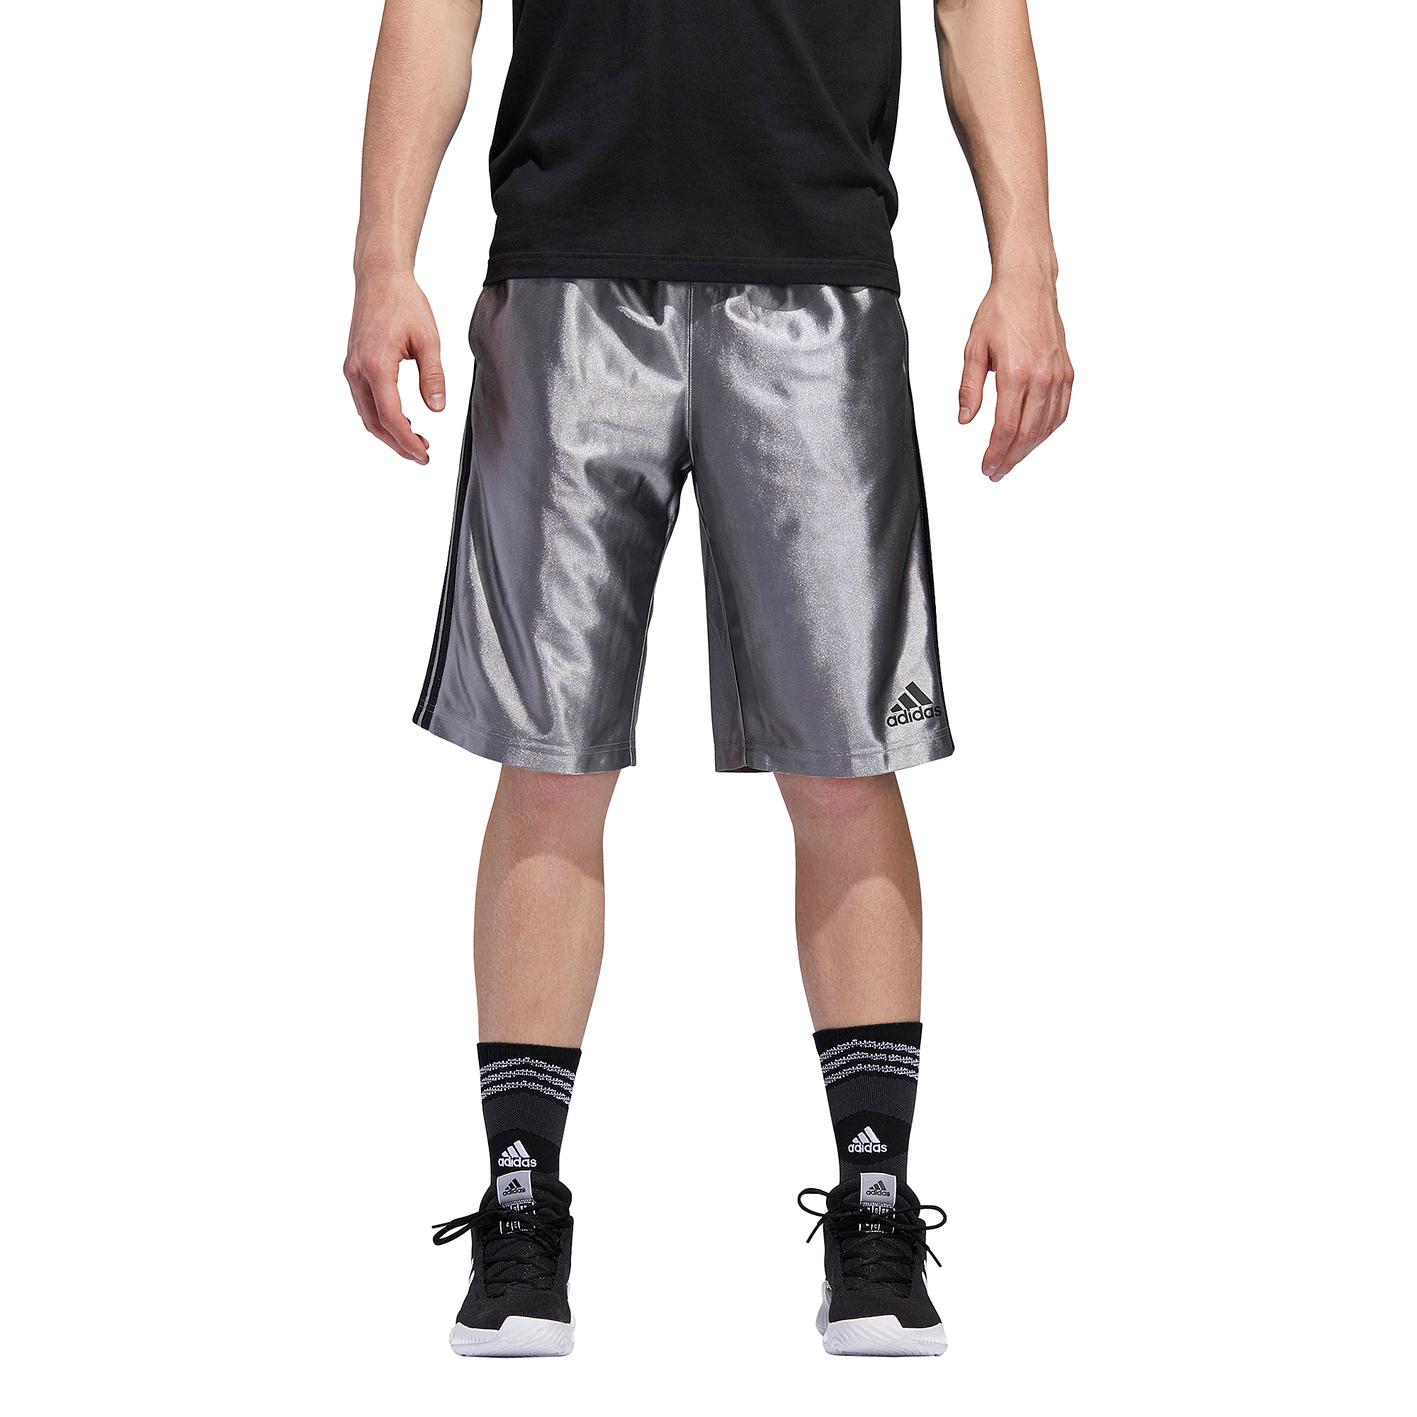 d5ca32a8e adidas New Basic 4 Shorts - Men's - Basketball - Clothing - Metallic ...